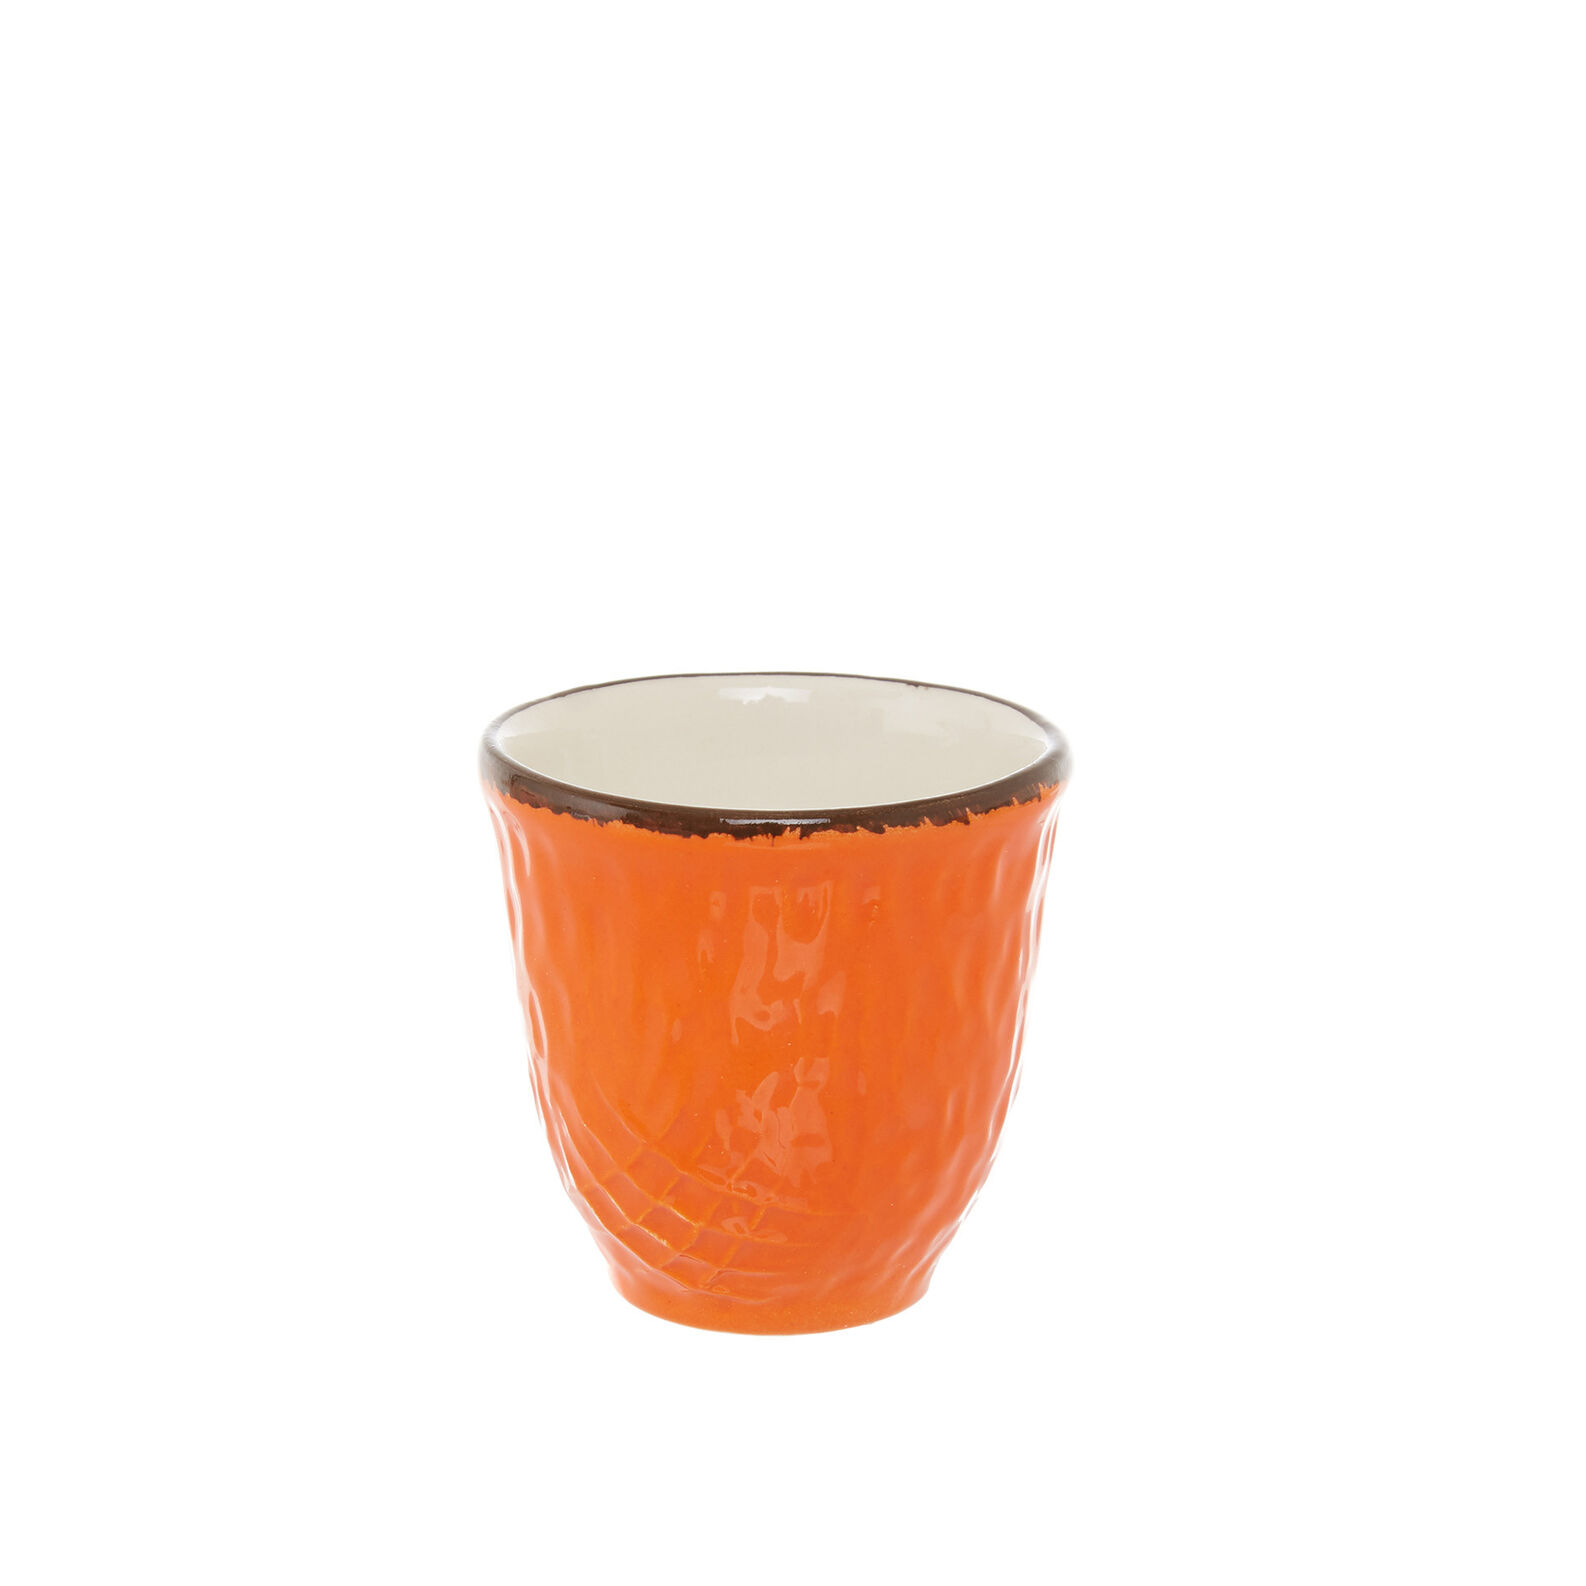 Preta Handmade ceramic coffee cup